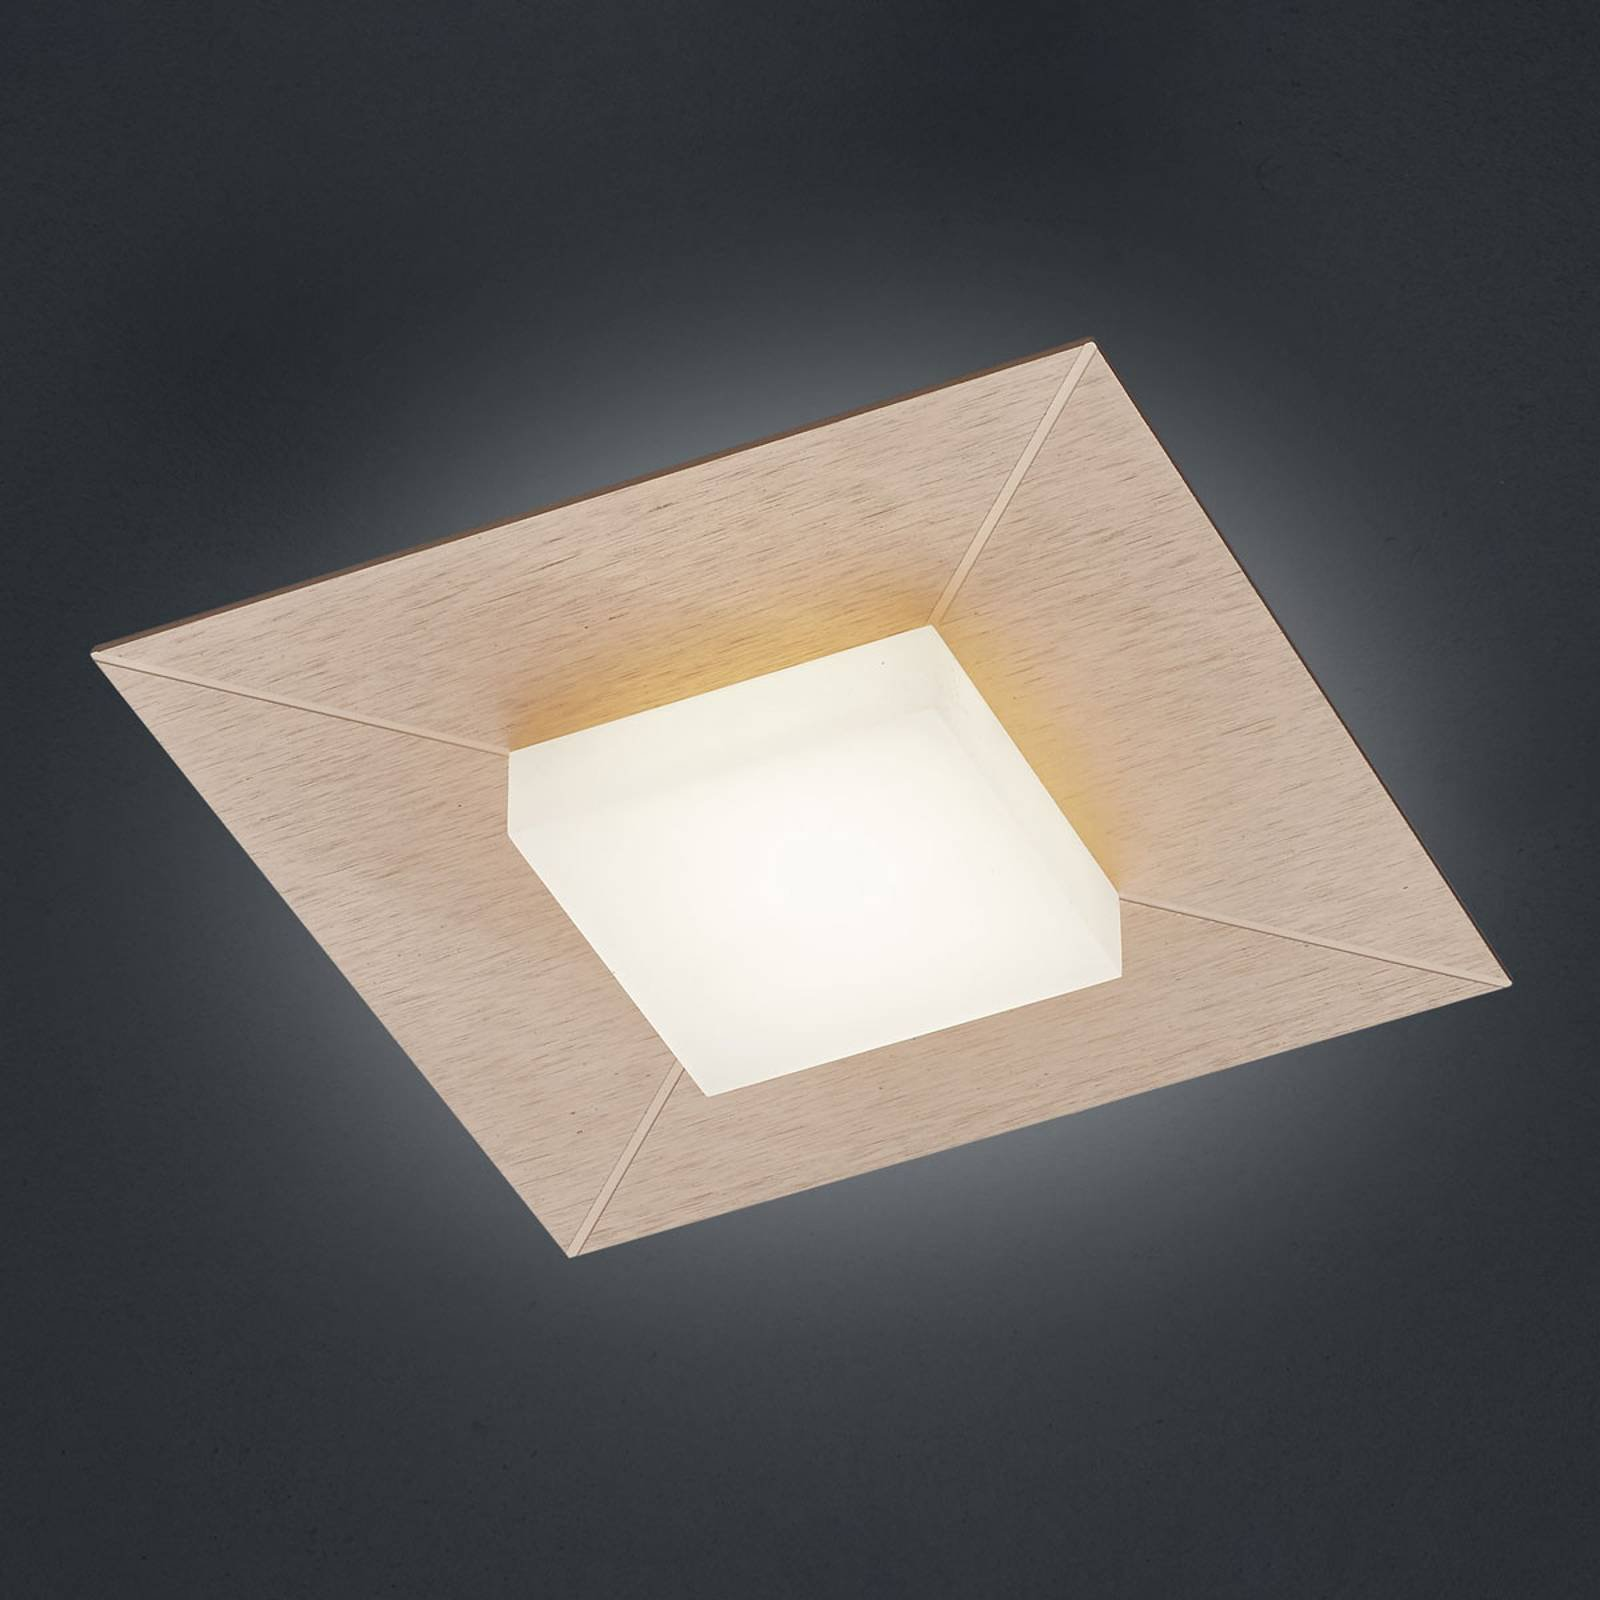 BANKAMP Diamond taklampe 17x17 cm, roségull